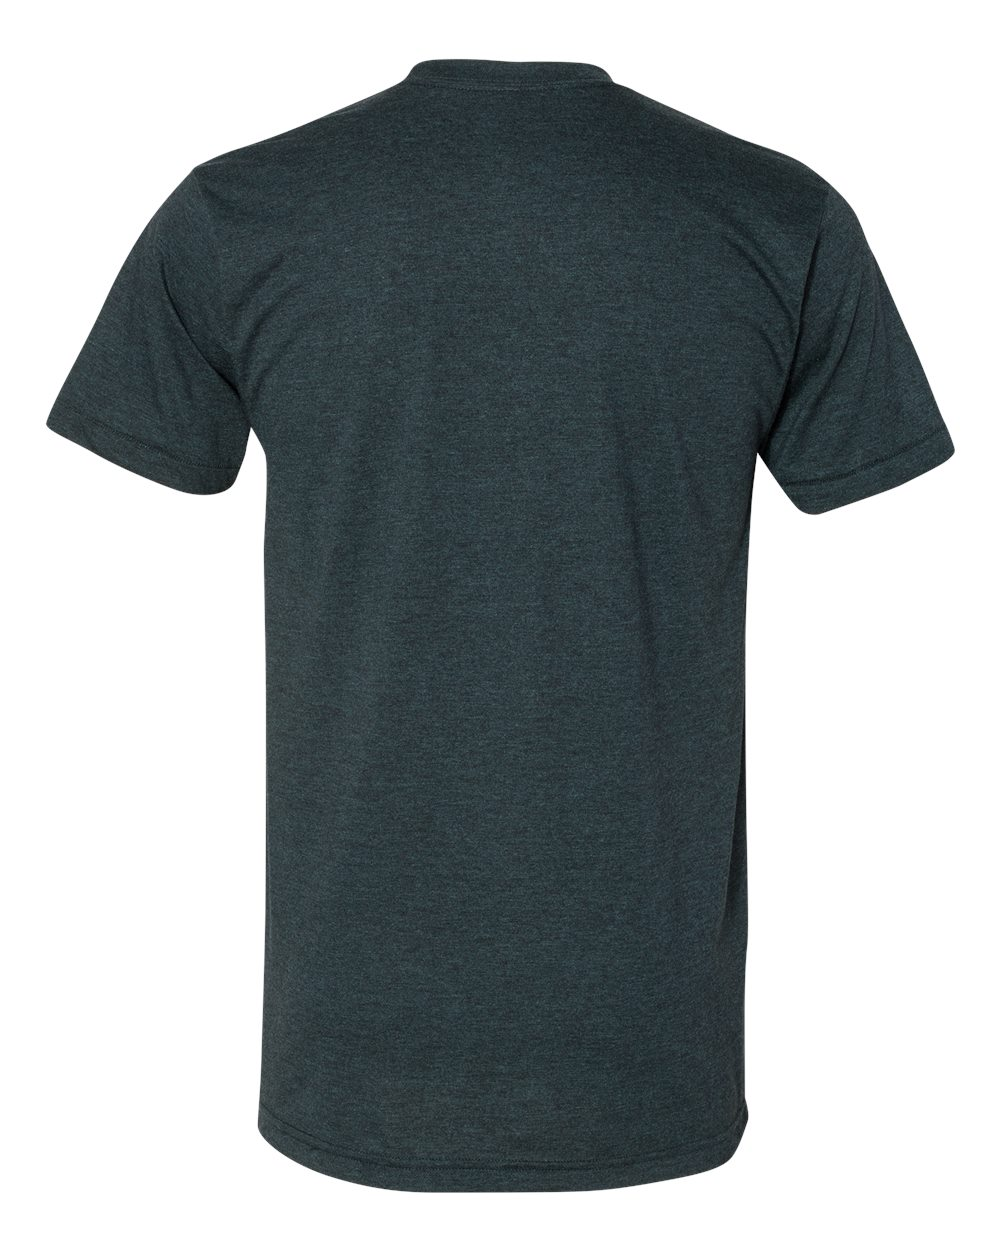 American-Apparel-Mens-Slim-Fit-50-50-Cotton-T-Shirt-Tee-BB401W-up-to-2XL thumbnail 13